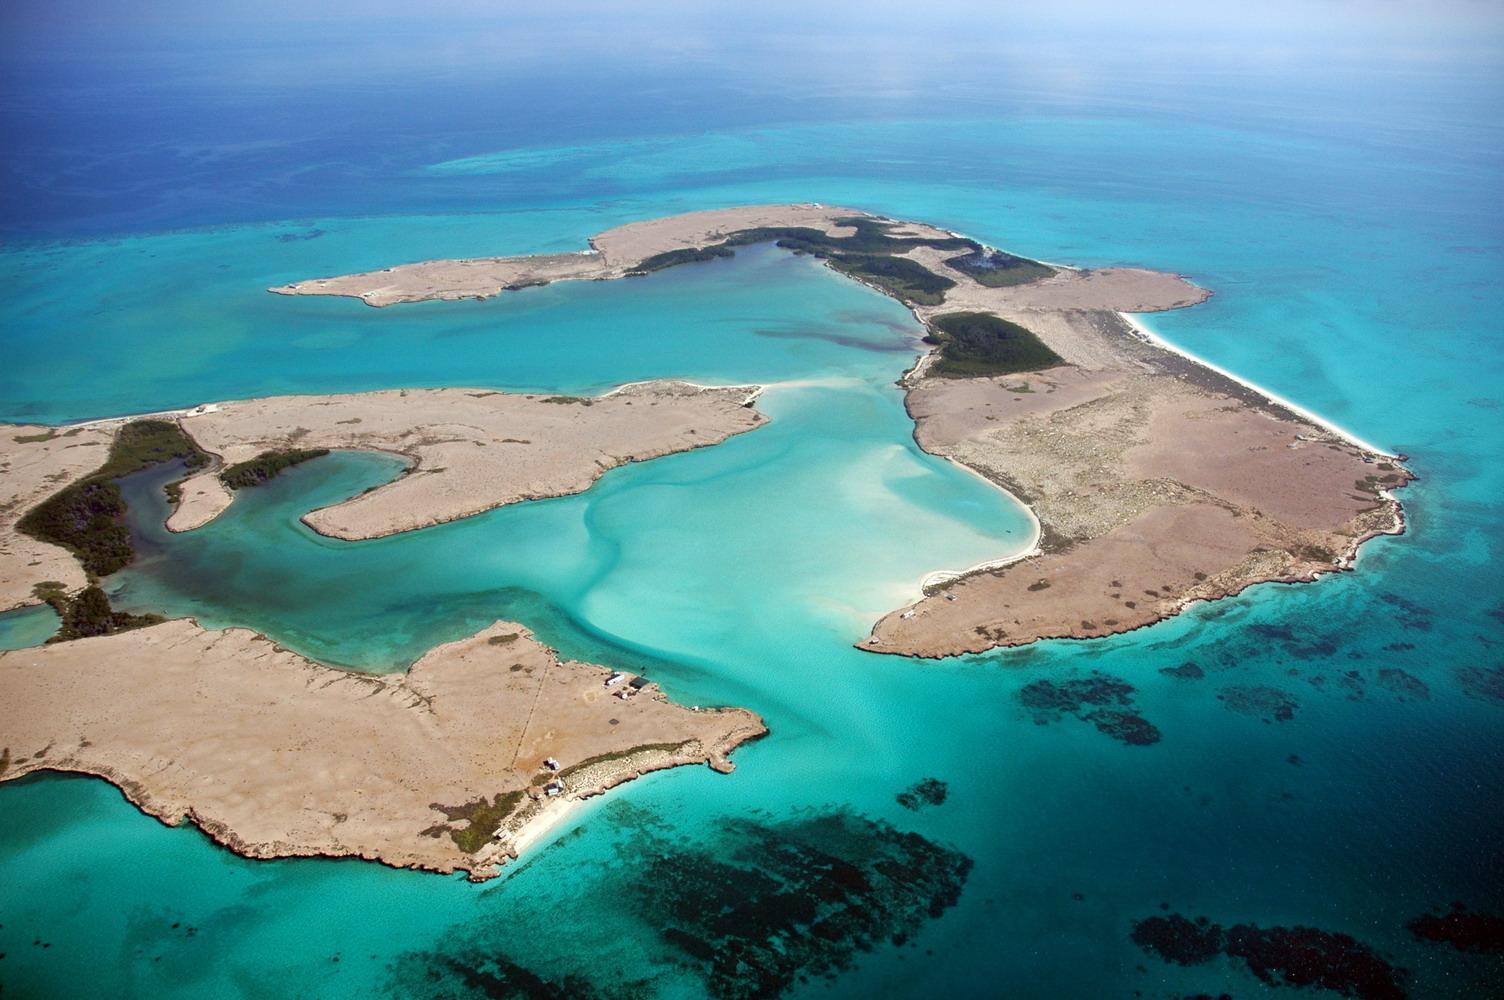 Les îles Maskali (Source http://j28ro.blogspot.com/2010_06_01_archive.html)